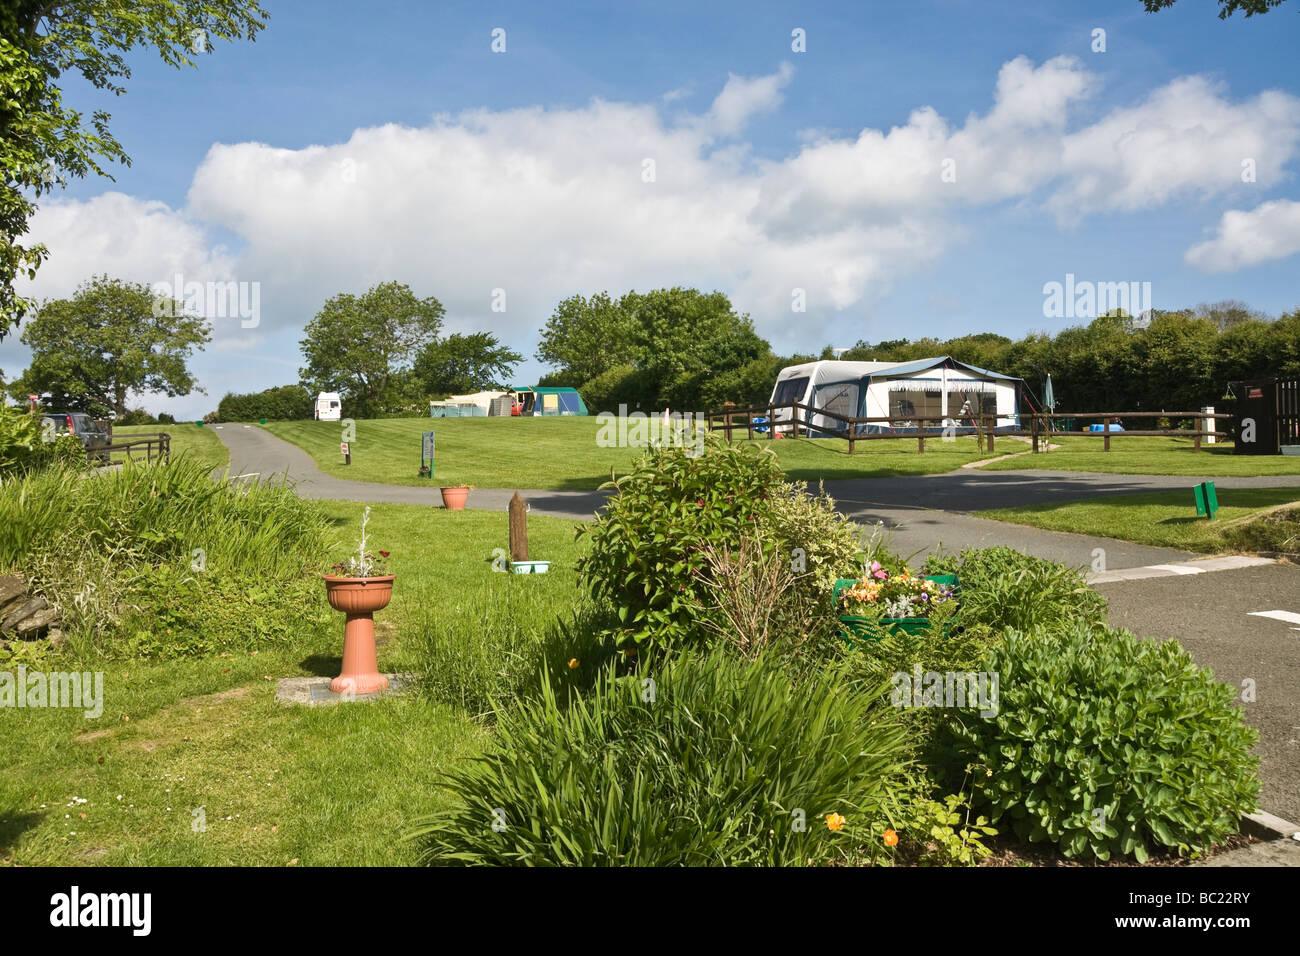 Caravan site at Cardigan Bay, Wales. Camping and Caravanning Club Site. - Stock Image